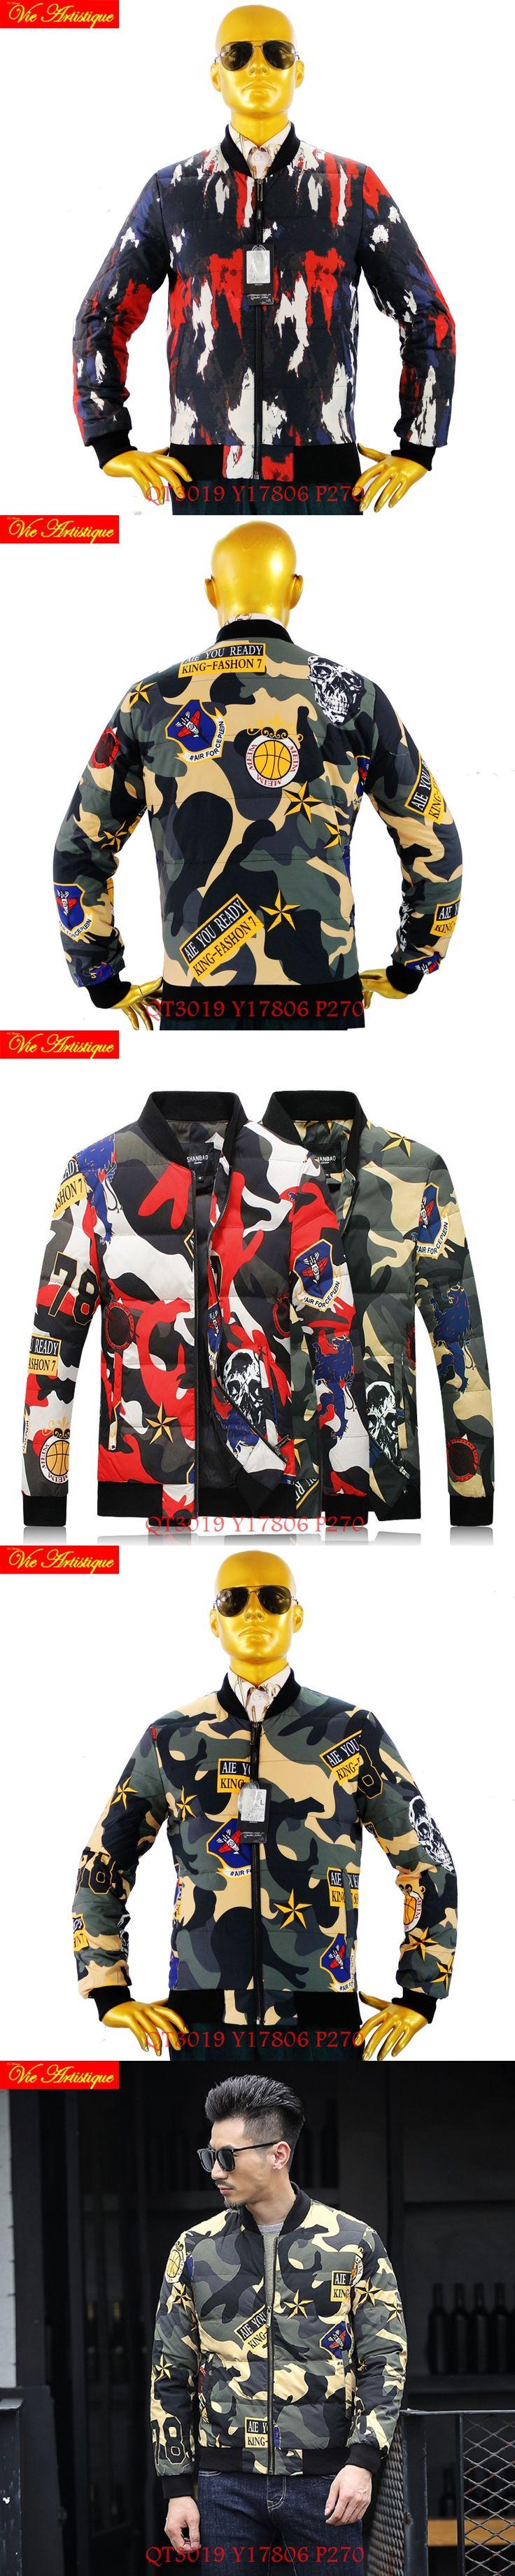 men's parkas homme winter leather coat and jacket light warm red green camouflage oversize 2017 winter new fashion parka men VA